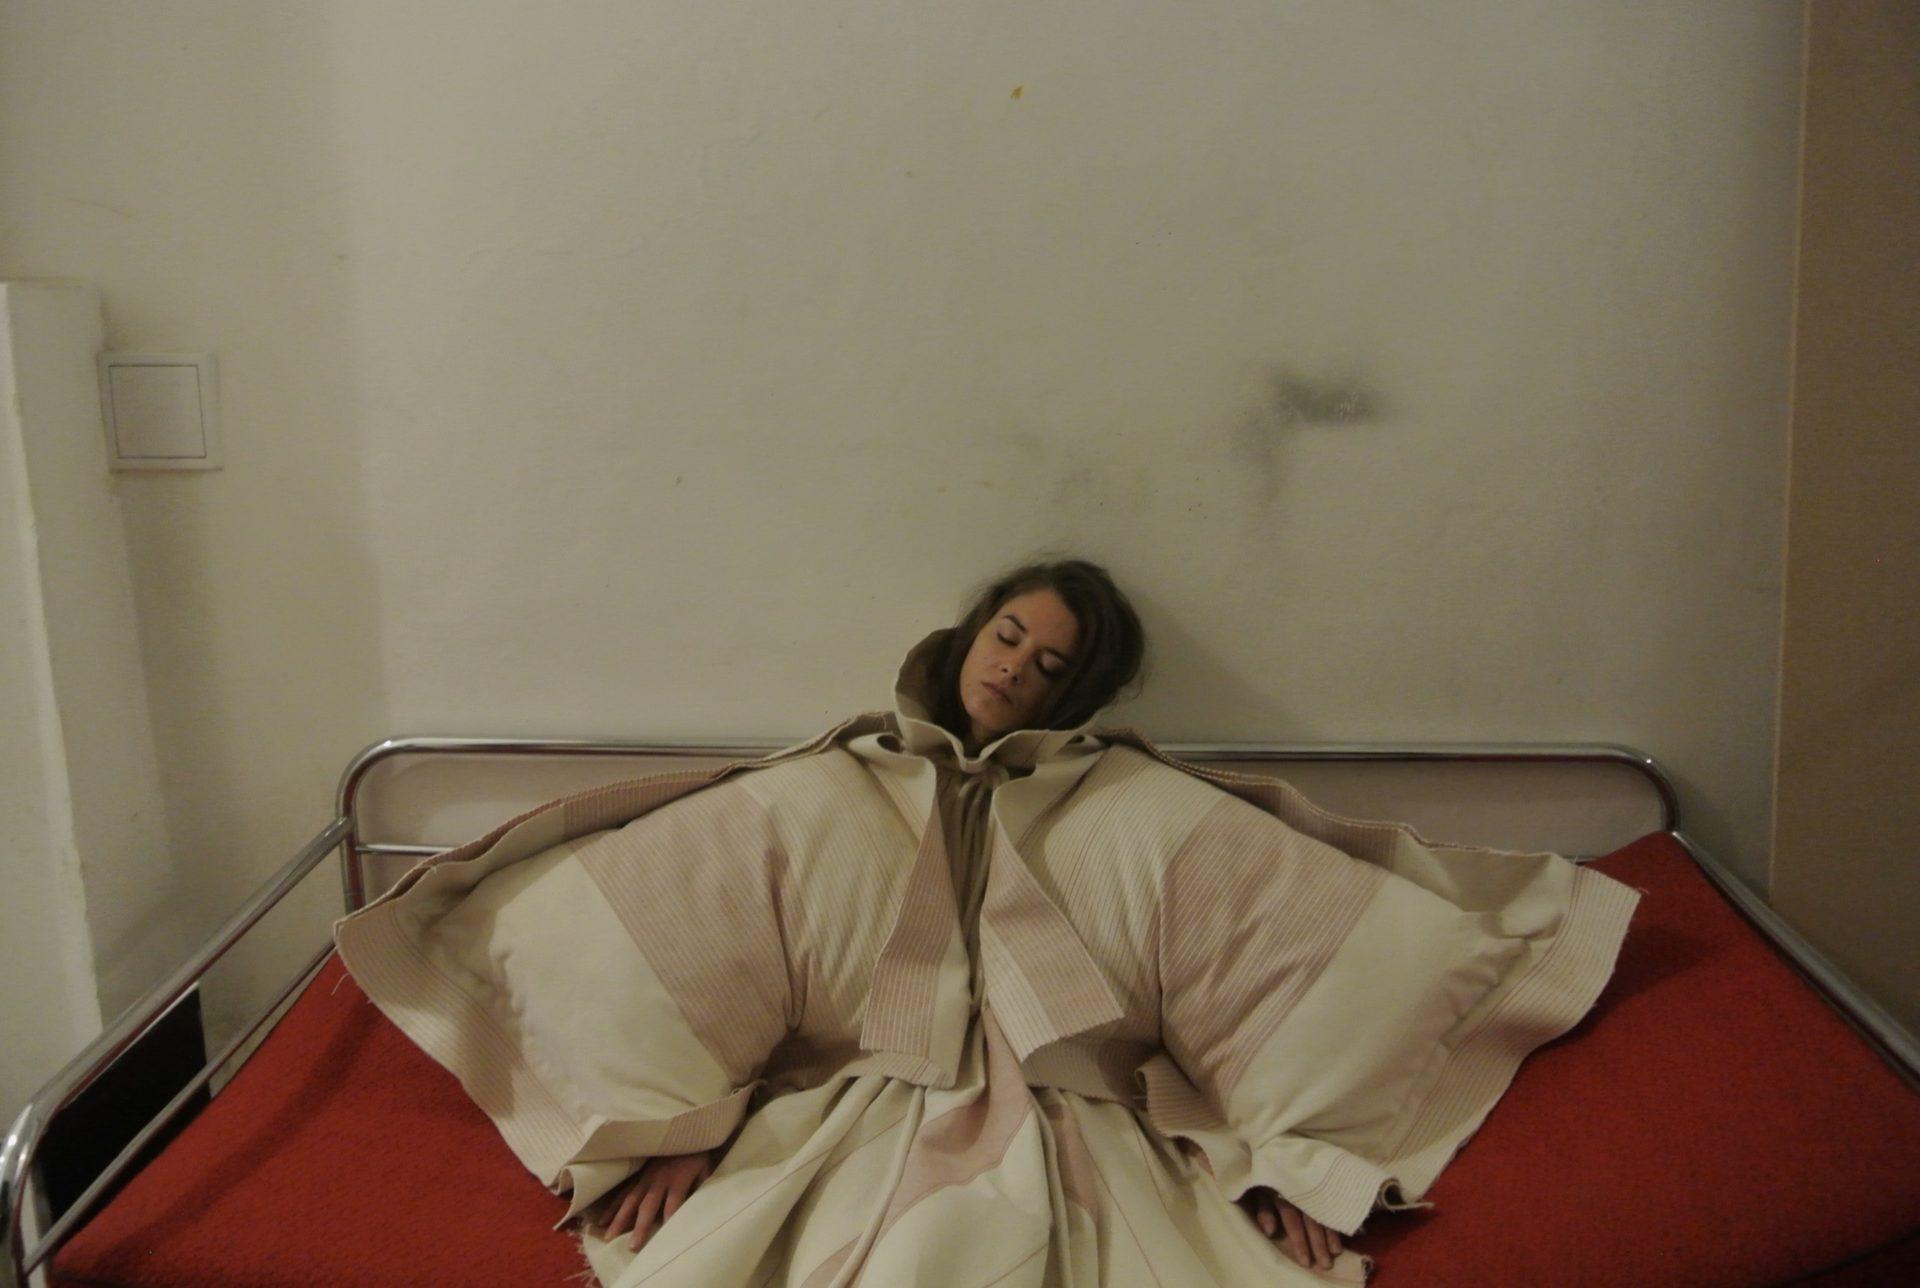 ARTEFACTS_SLEEPING CAMPAIGN 1_FOTILA Michaela_capkova